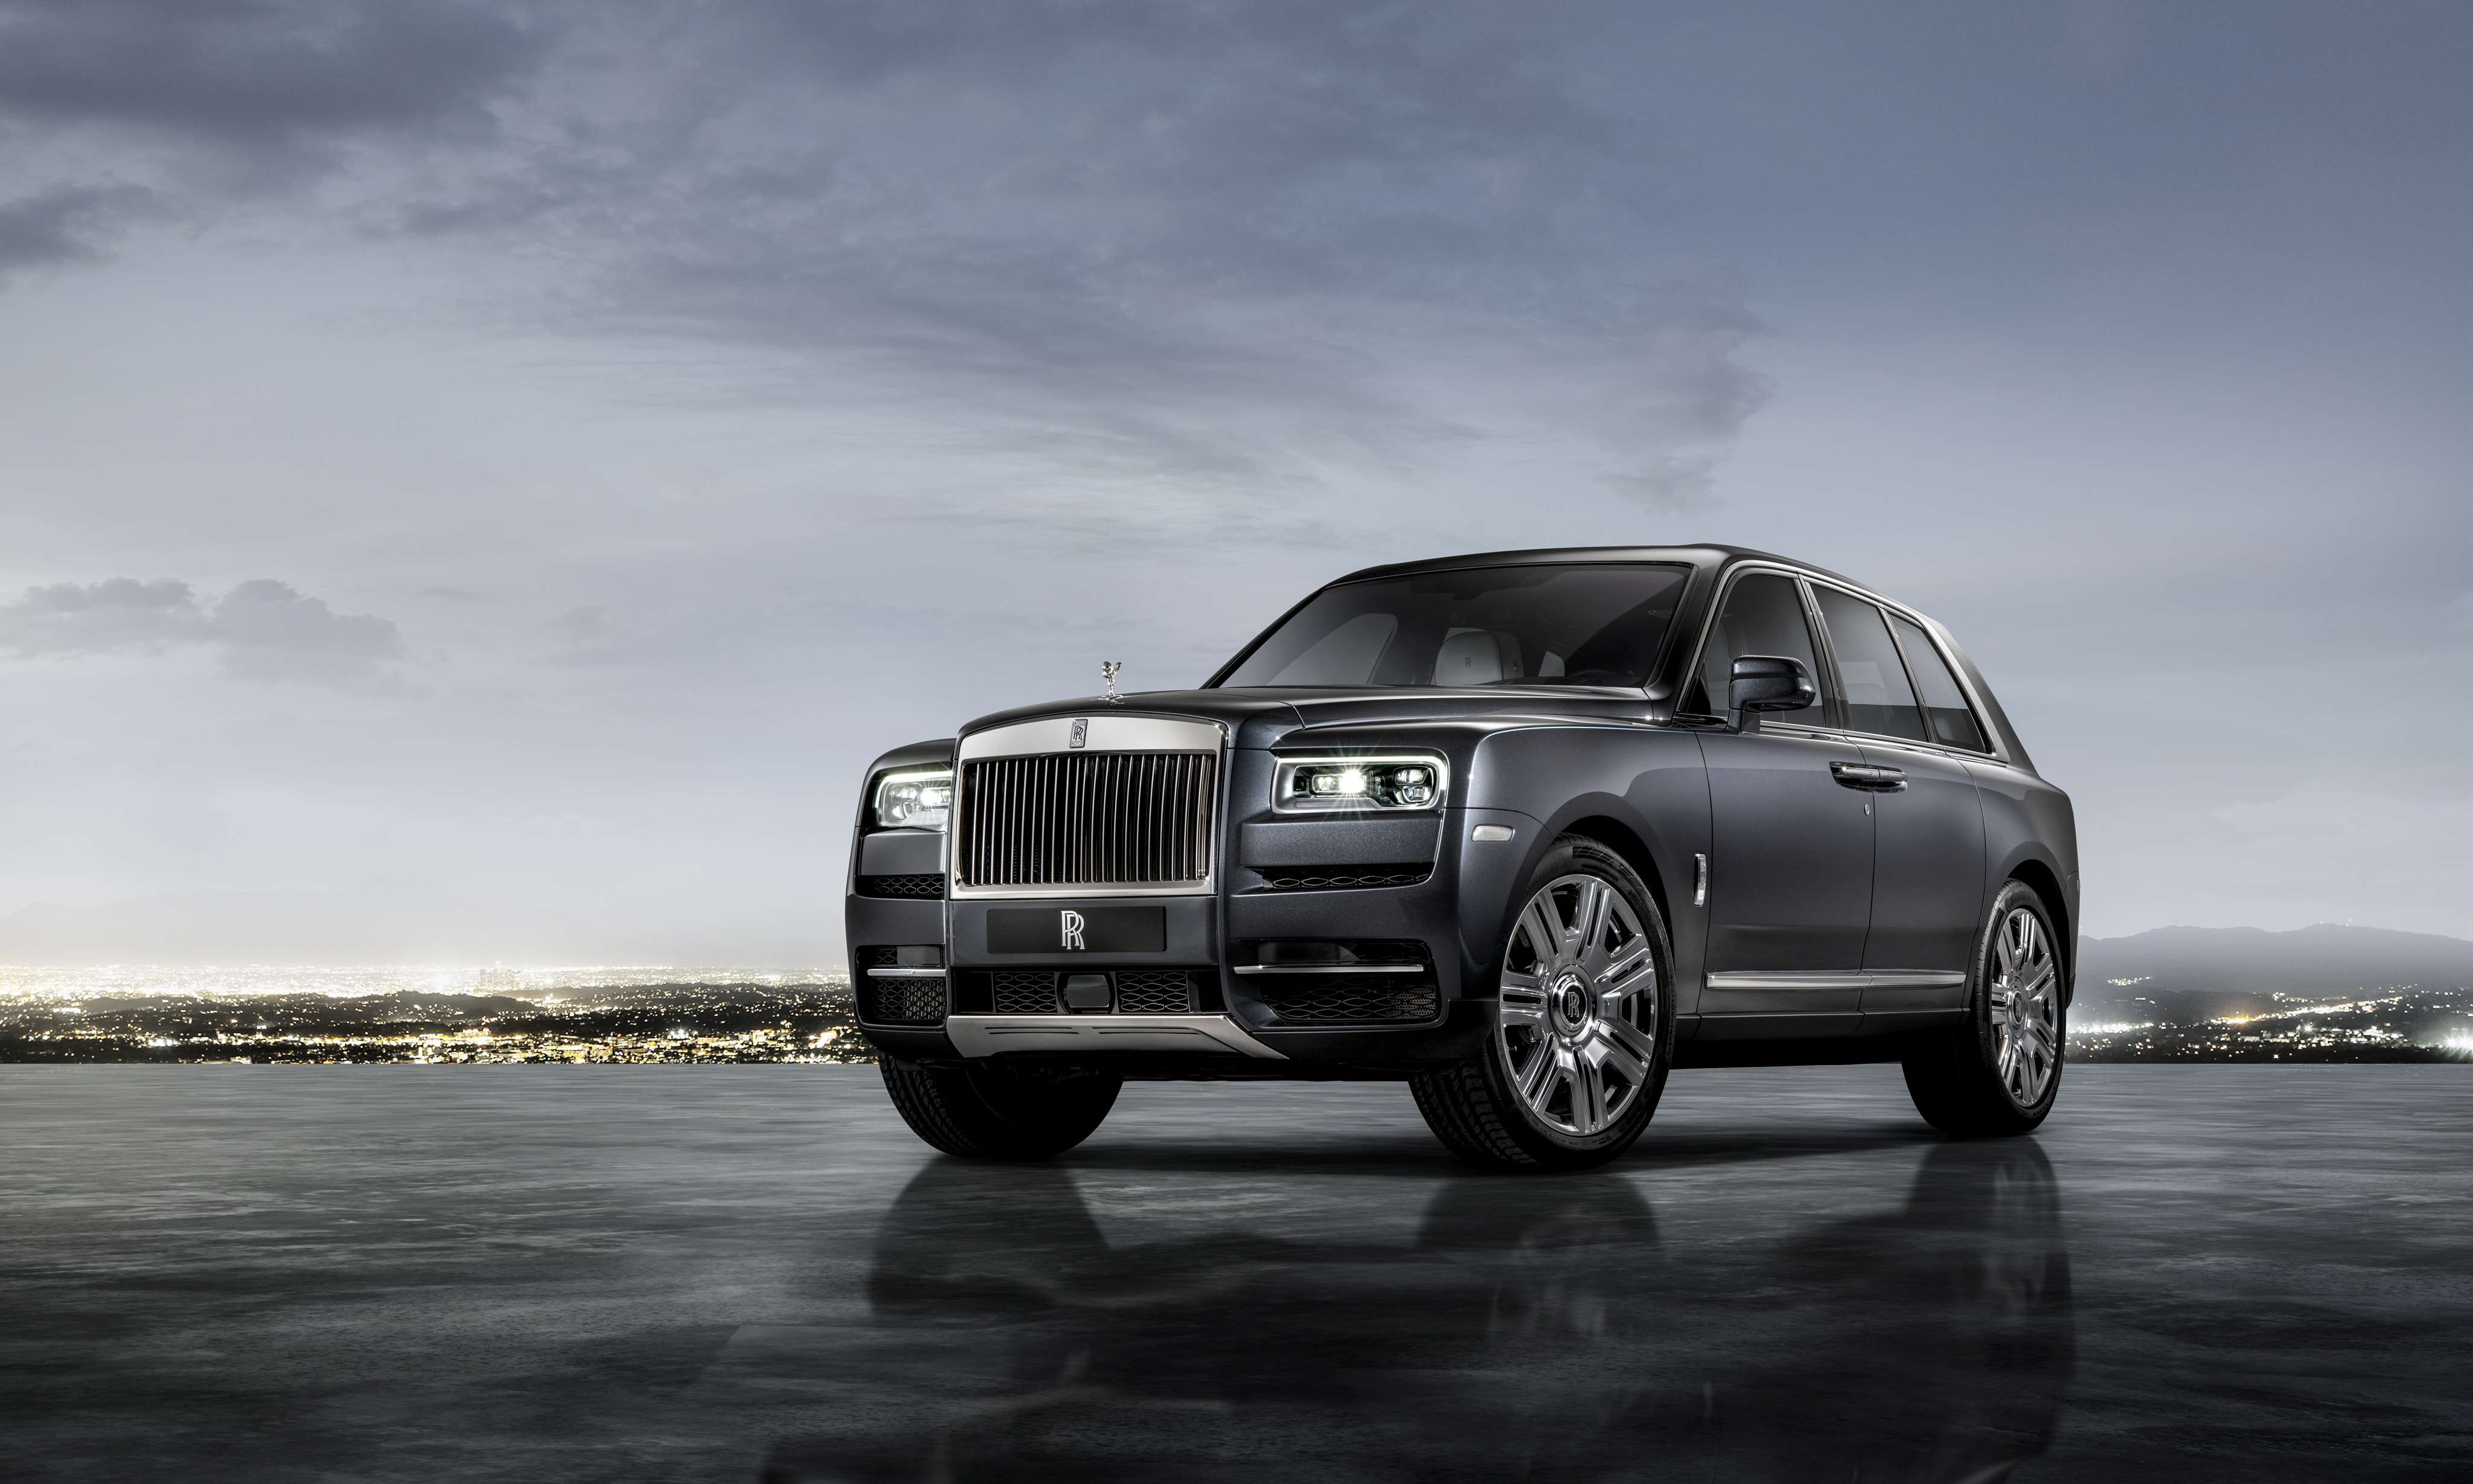 Rolls Royce Cullinan 4k Hd Cars 4k Wallpapers Images